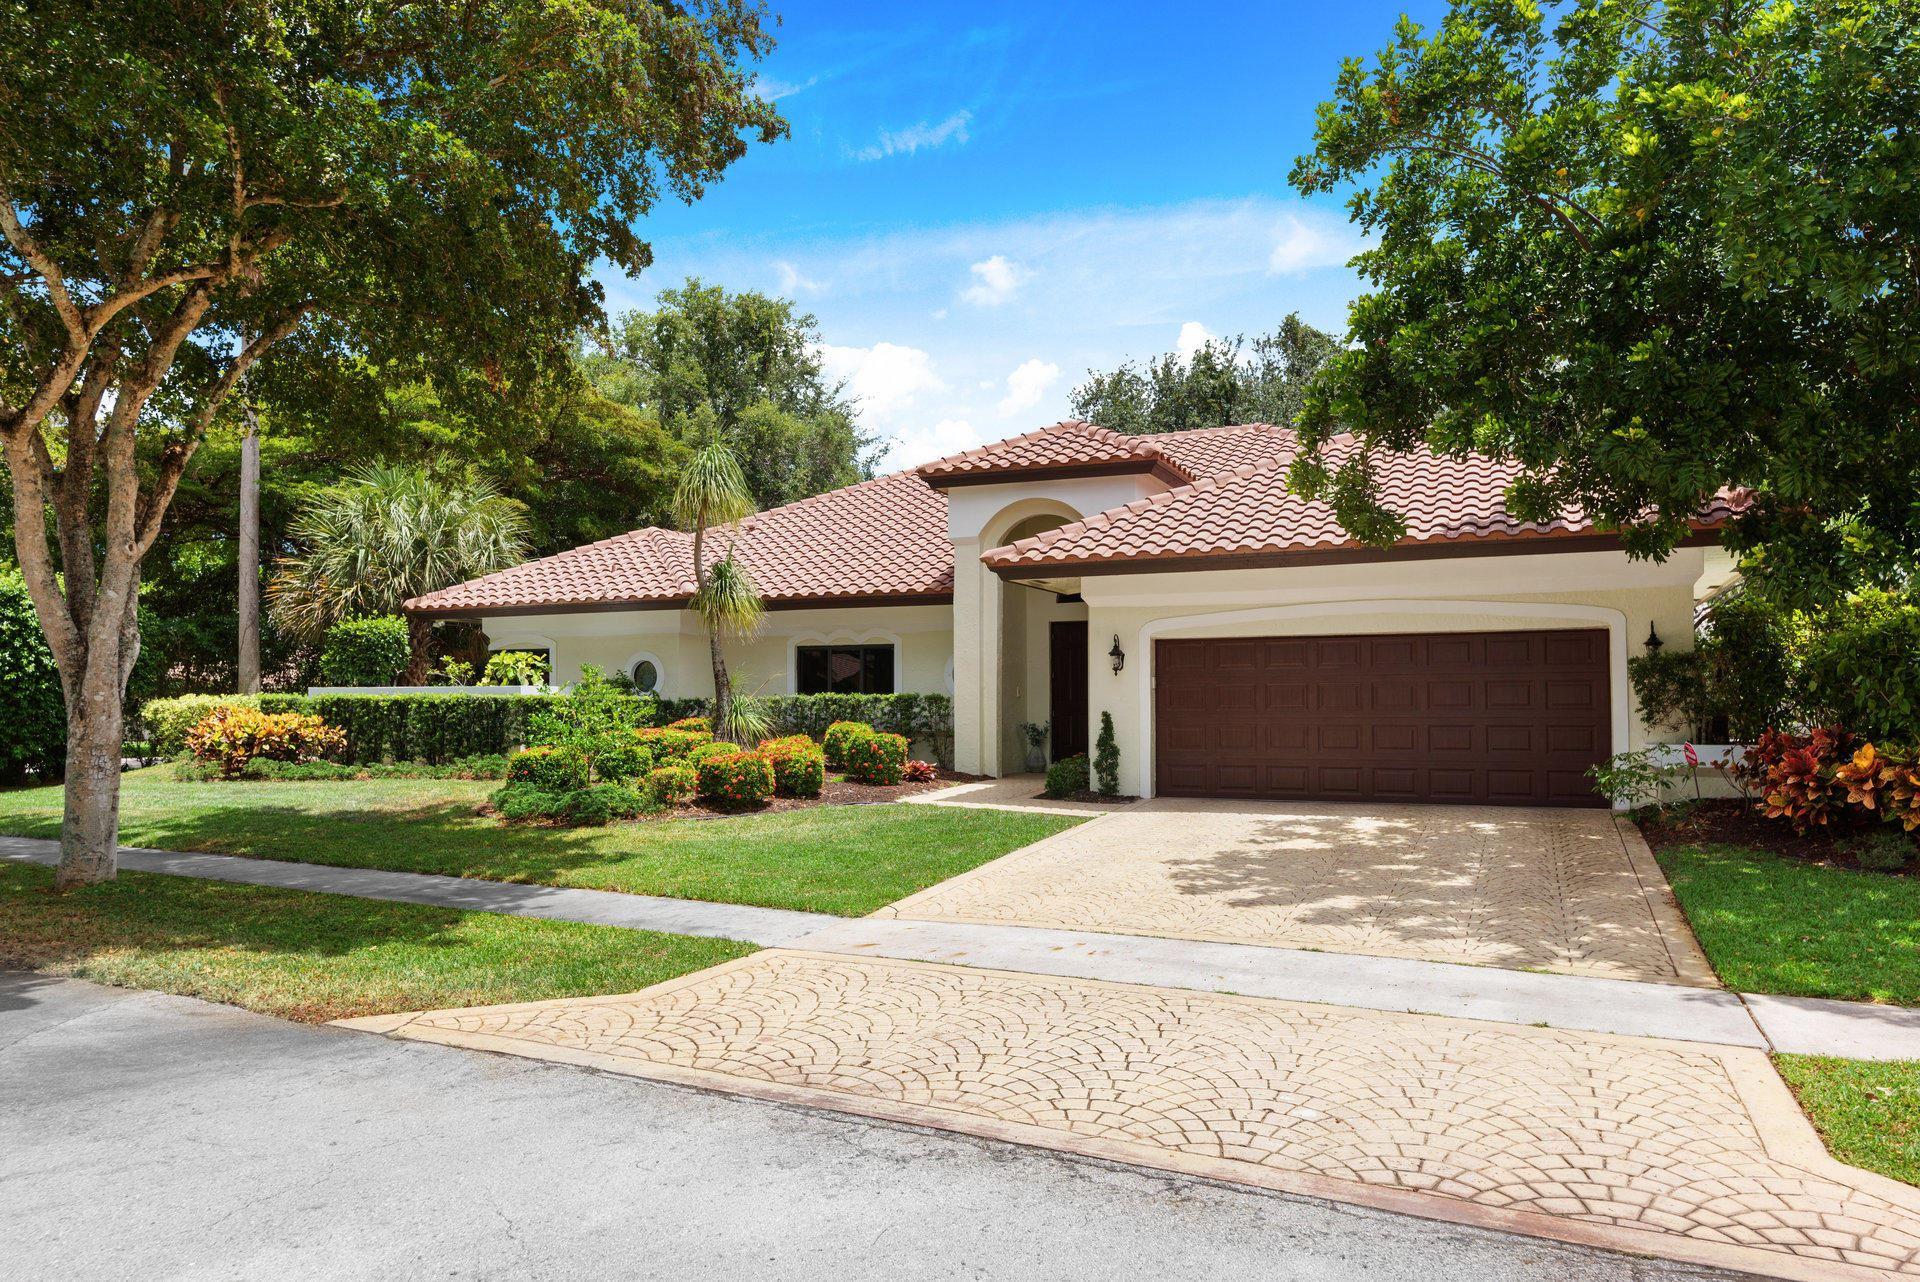 4600 NW 28th Way, Boca Raton, FL 33434 - MLS#: RX-10722602